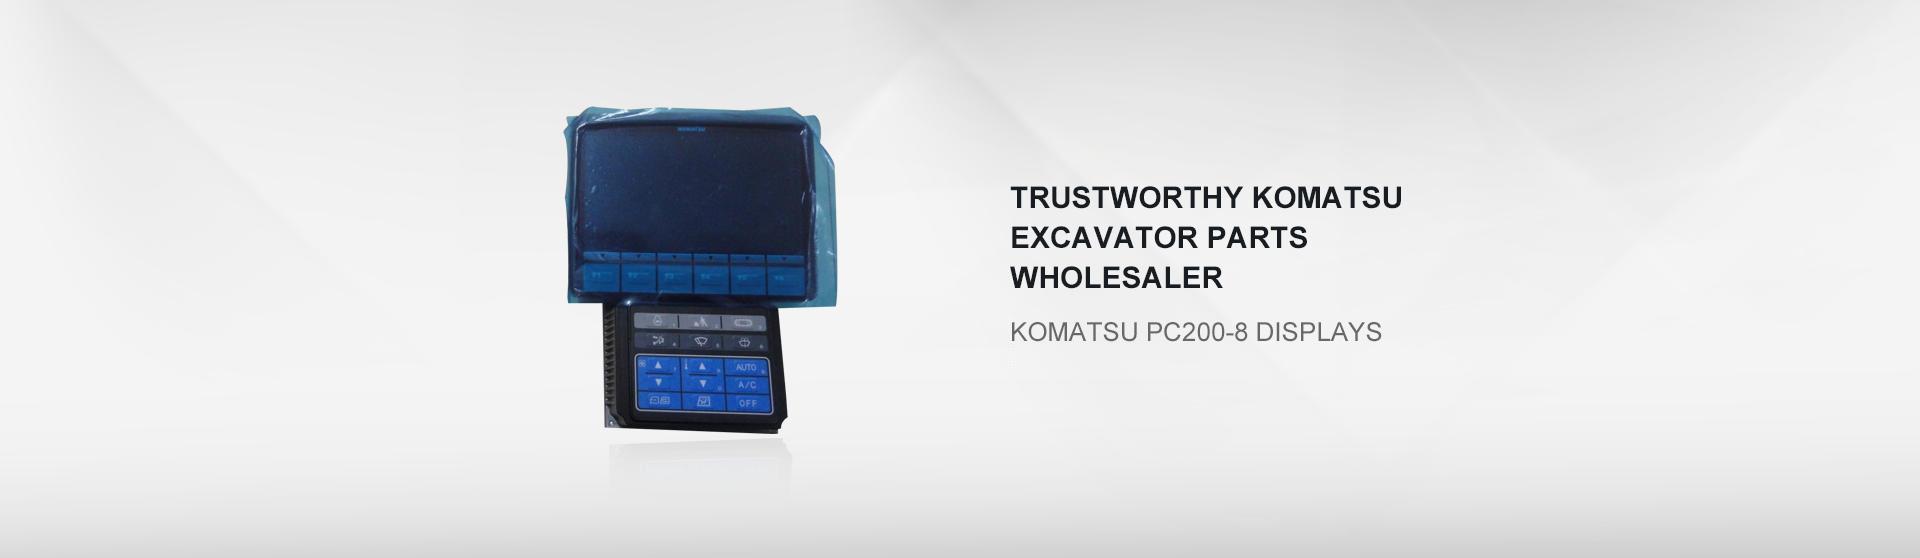 Komatsu PC200-8 displays